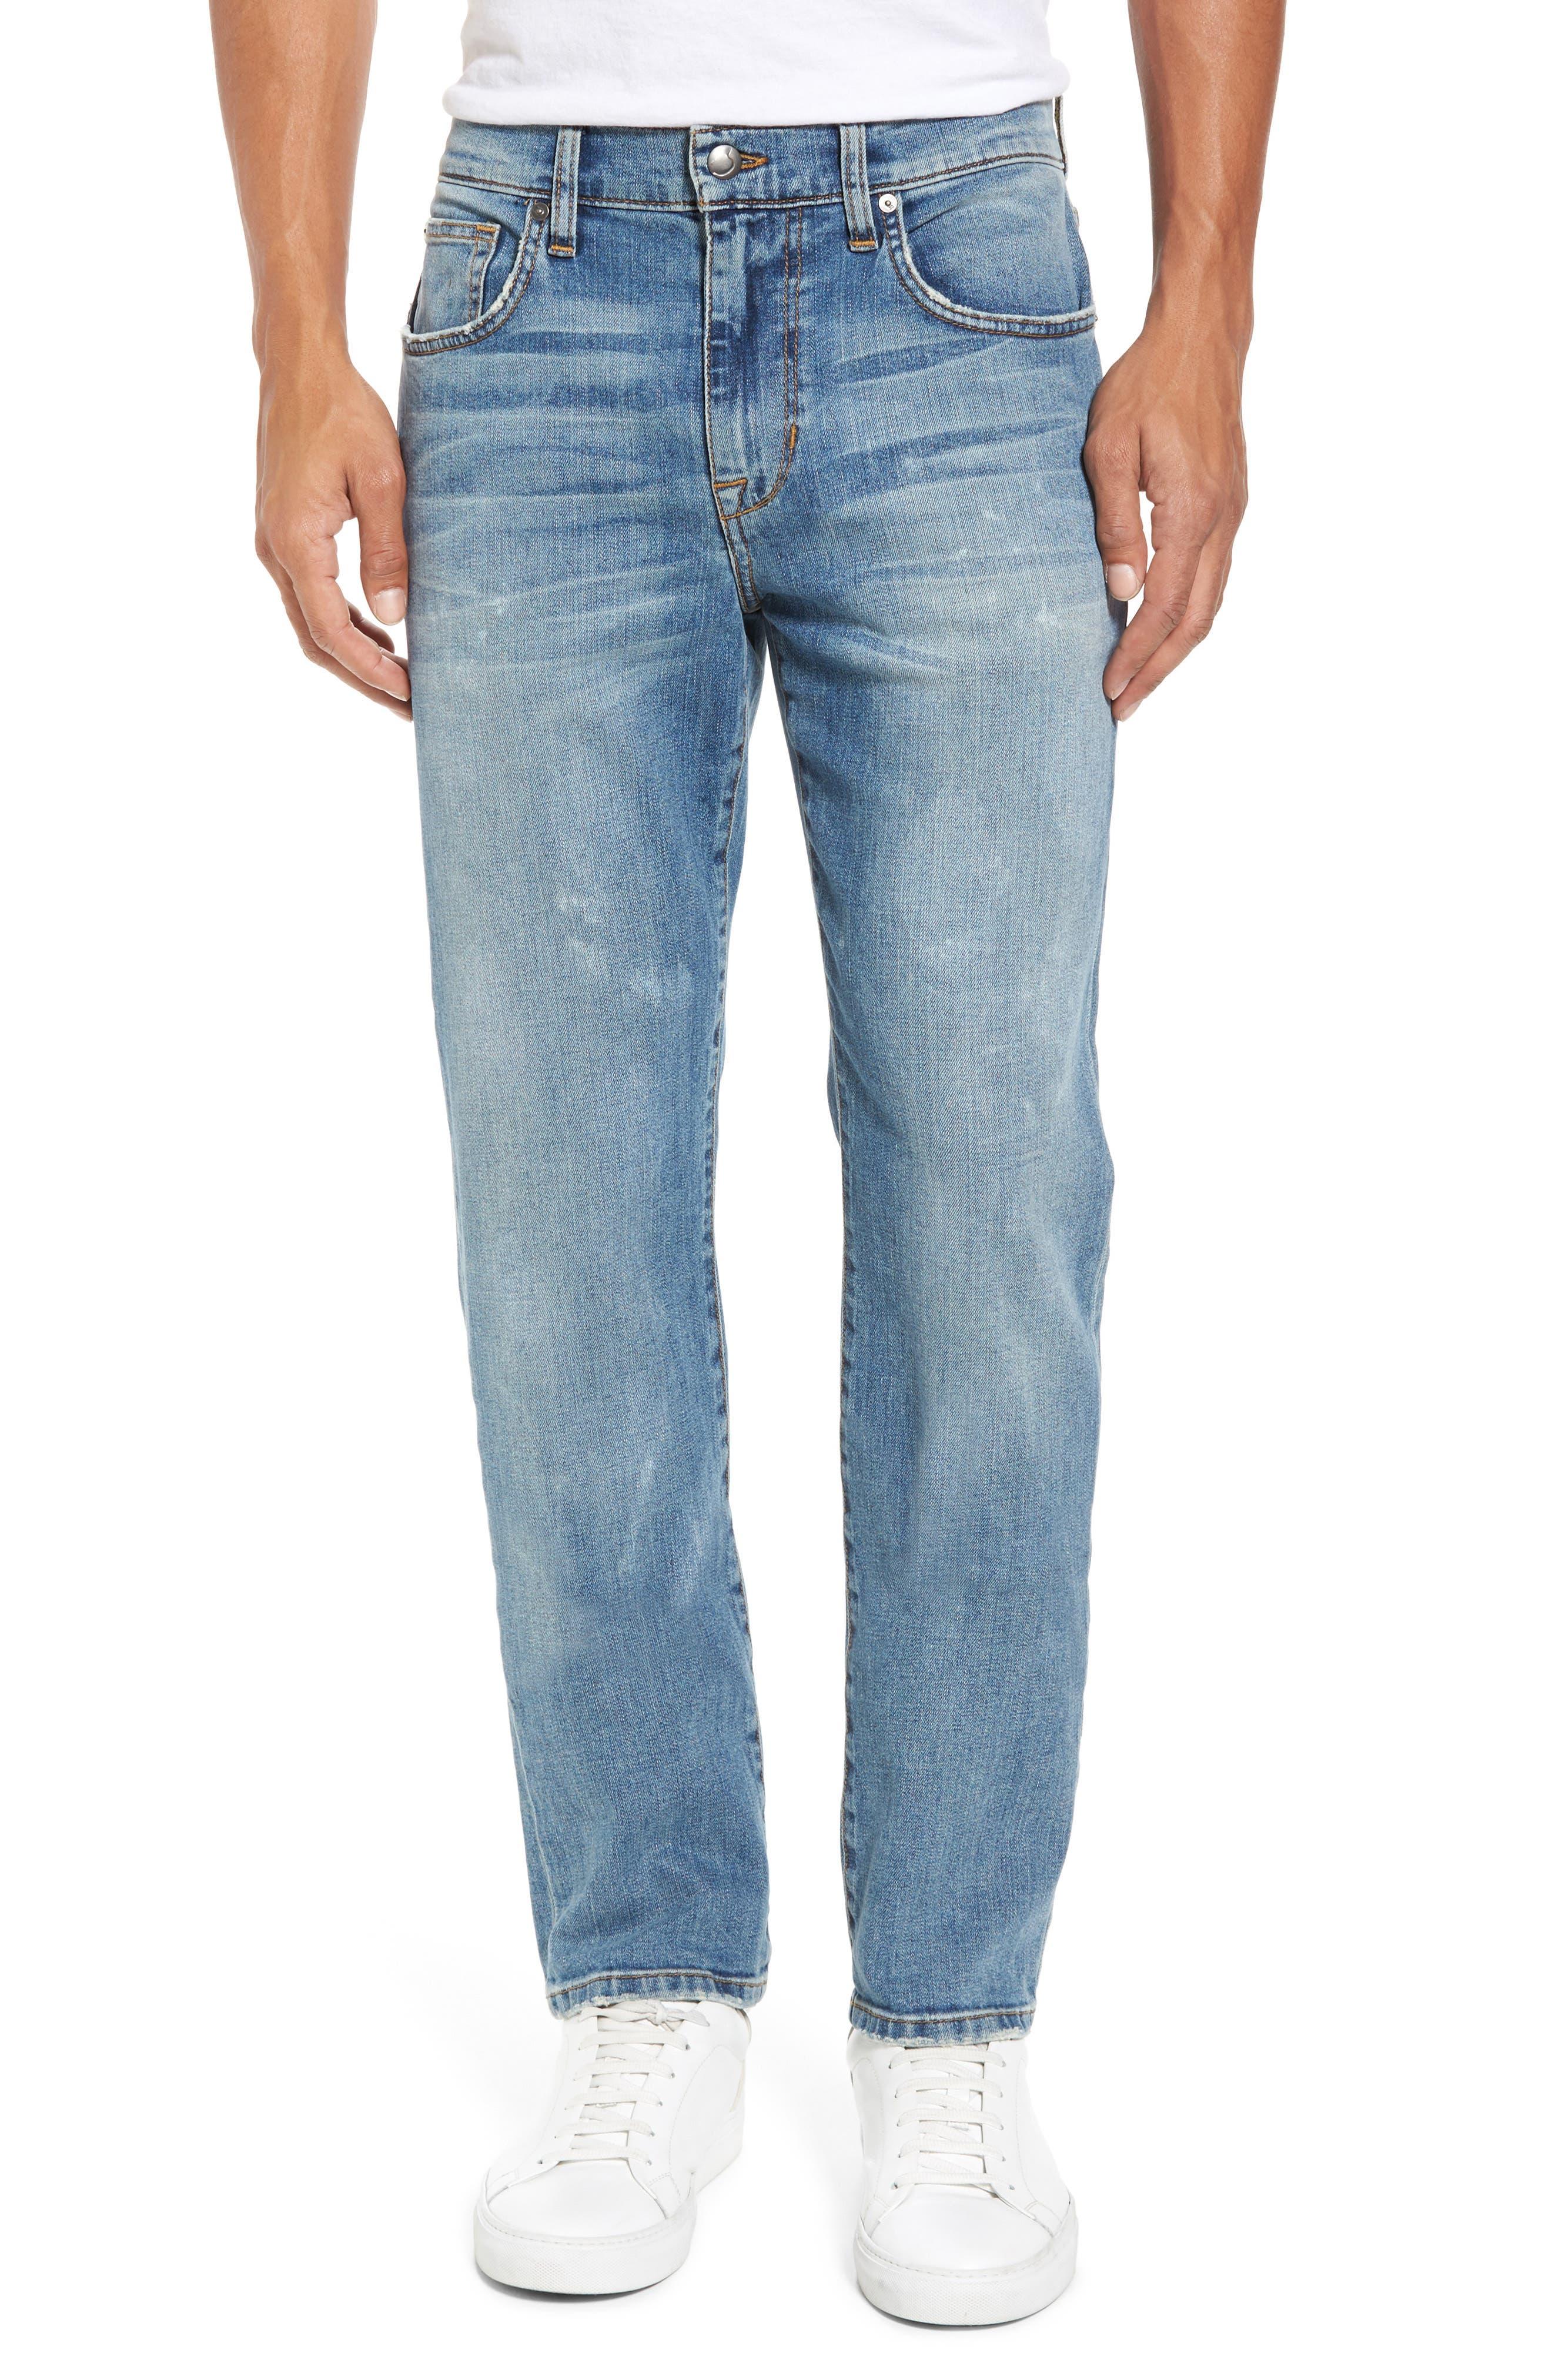 Main Image - Joe's Brixton Slim Straight Fit Jeans (Wyman)